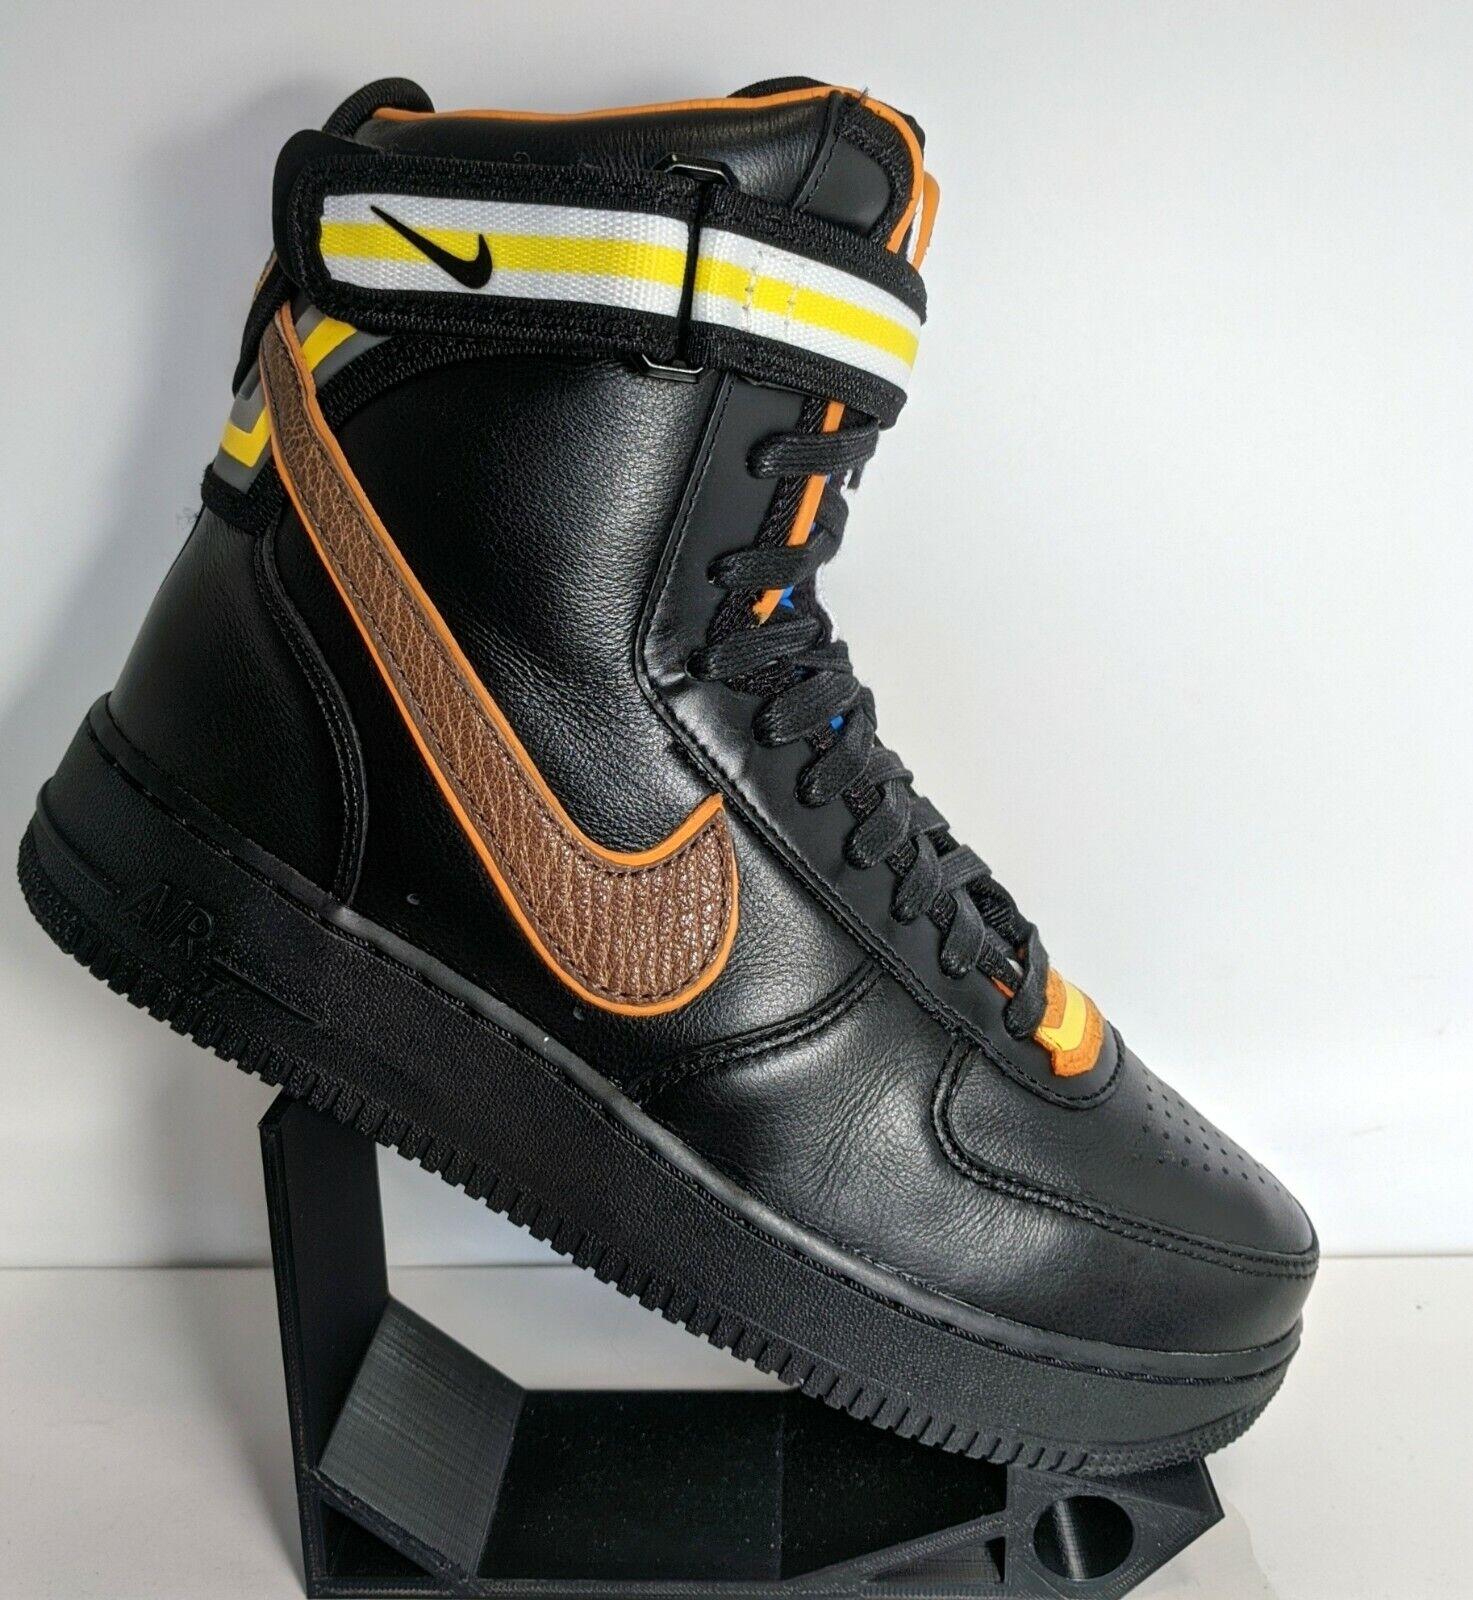 Nike Air Force 1 Hi SP Riccardo Tisci